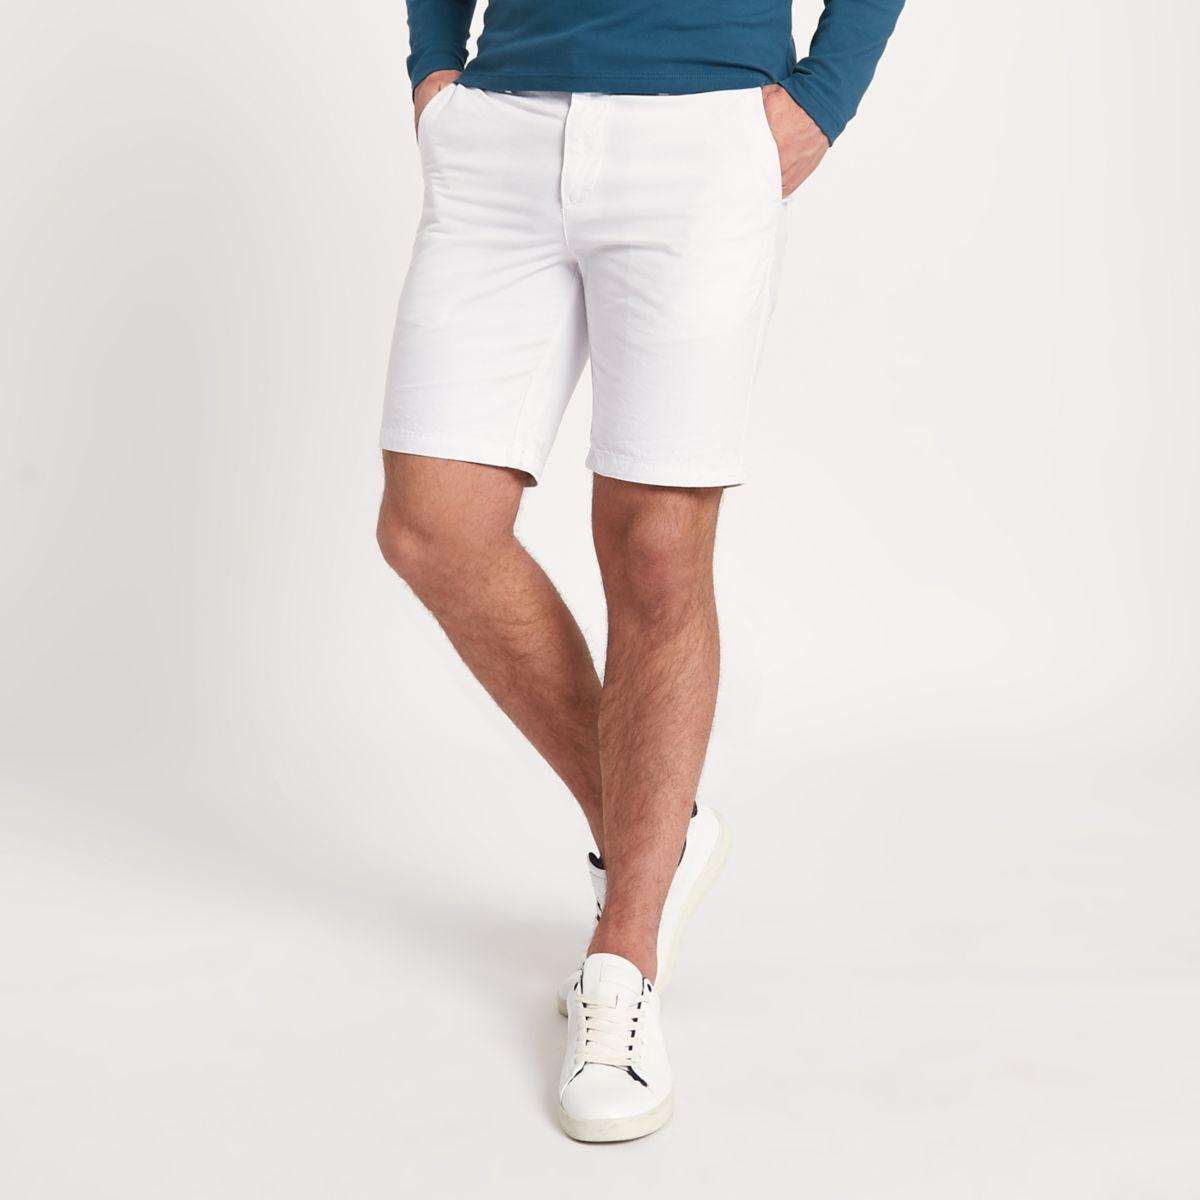 White slim fit chino shorts